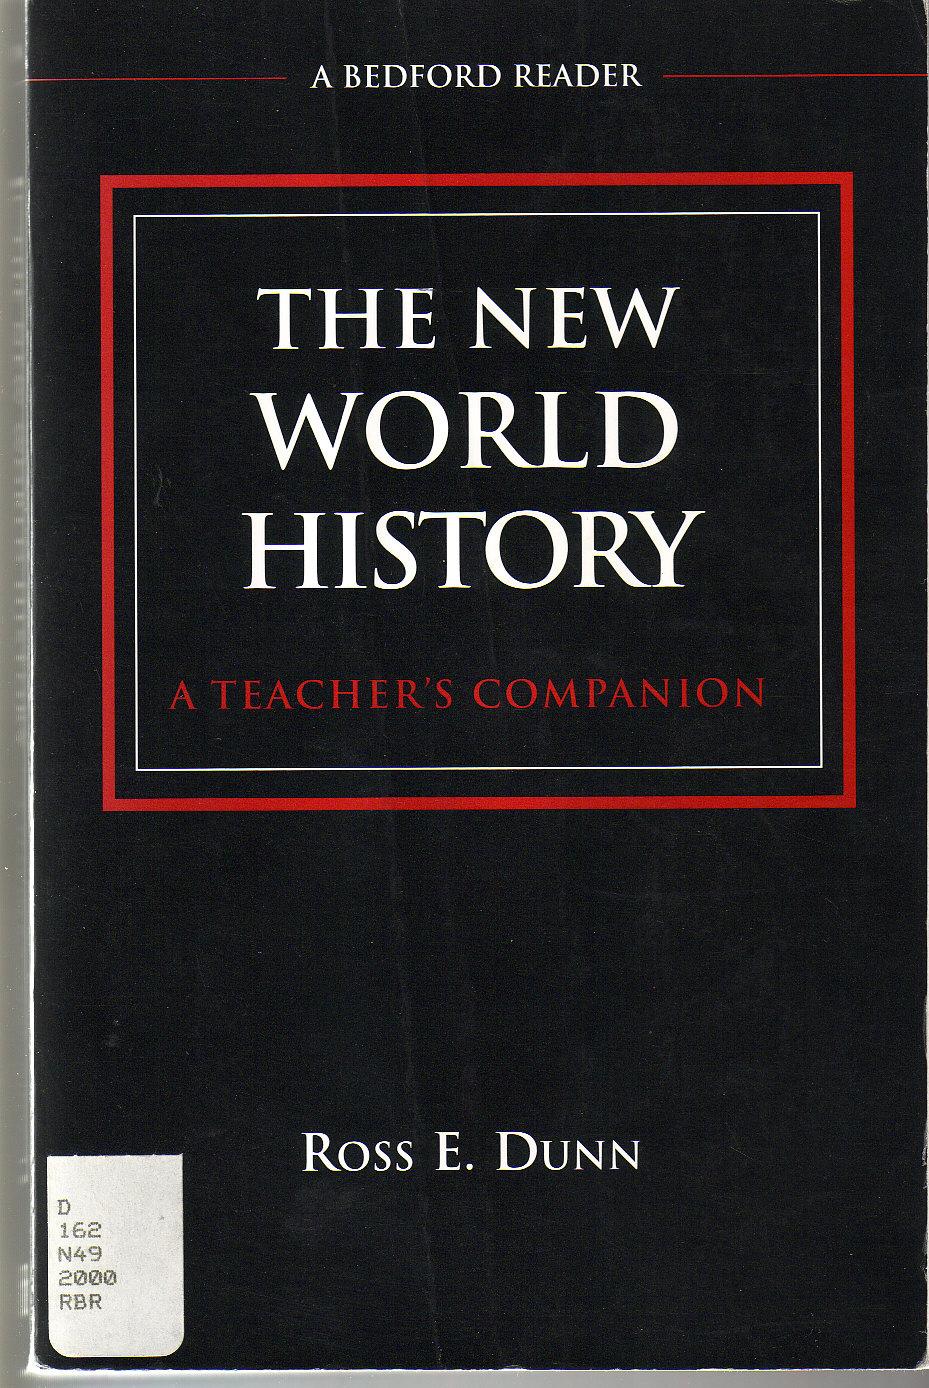 NWH 2000 cover.jpg